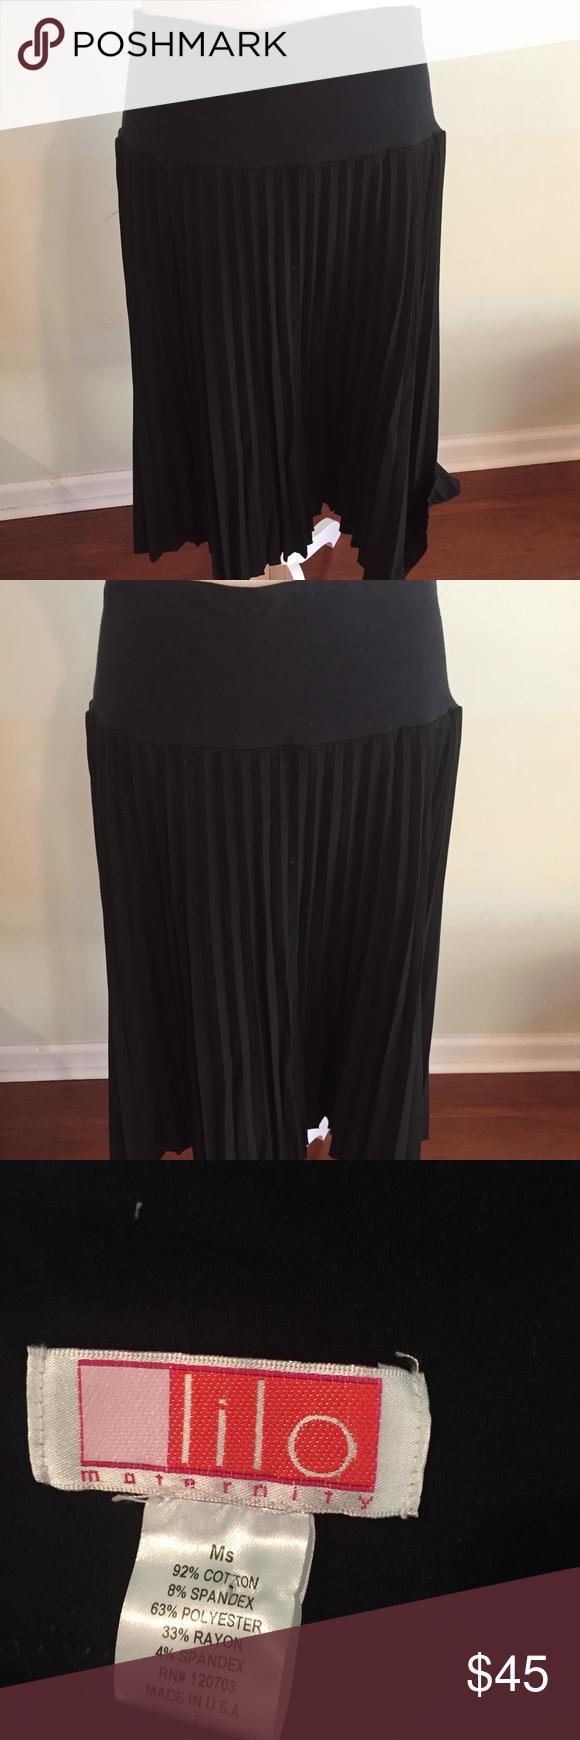 019e468c2146e Wear to Work Lilo Maternity Corduroy Pleated Skirt